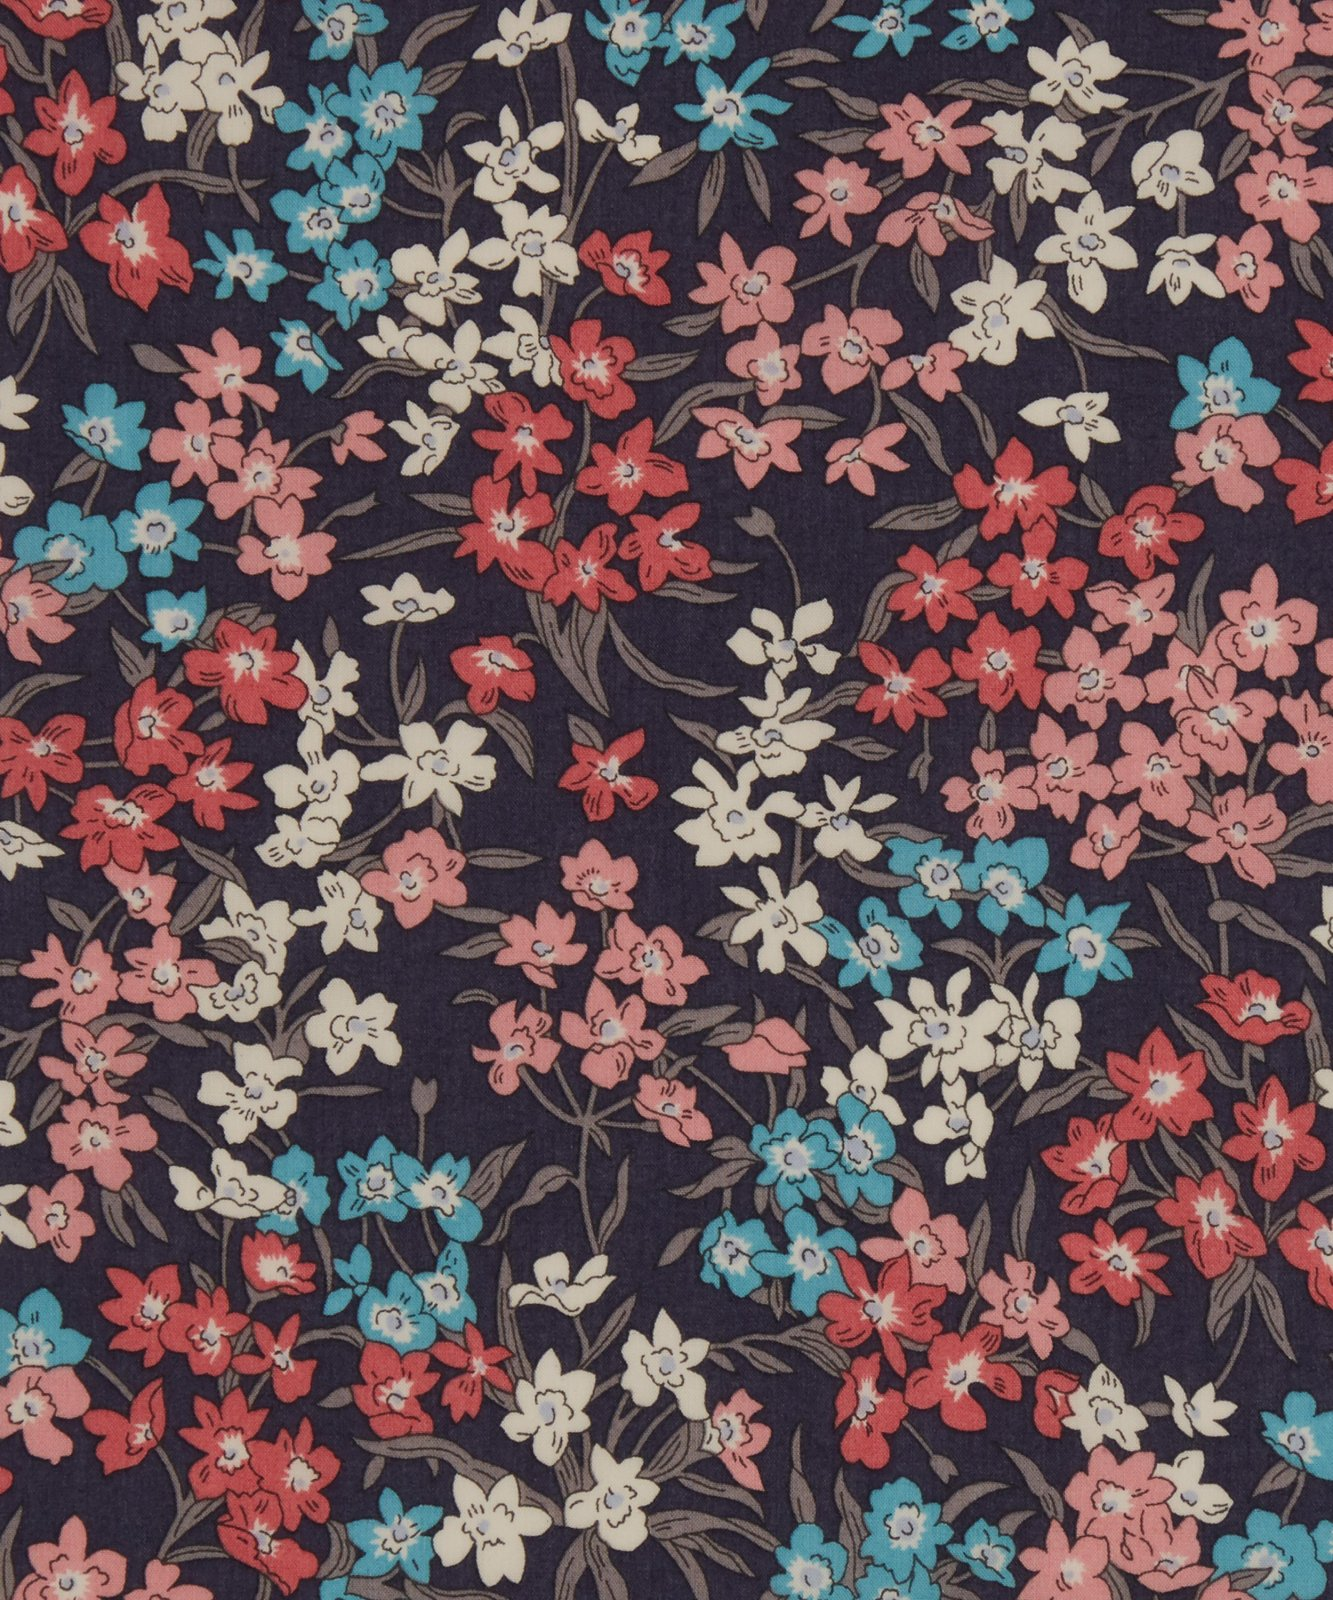 Sea Blossoms B Liberty of London Tana Lawn Fabric